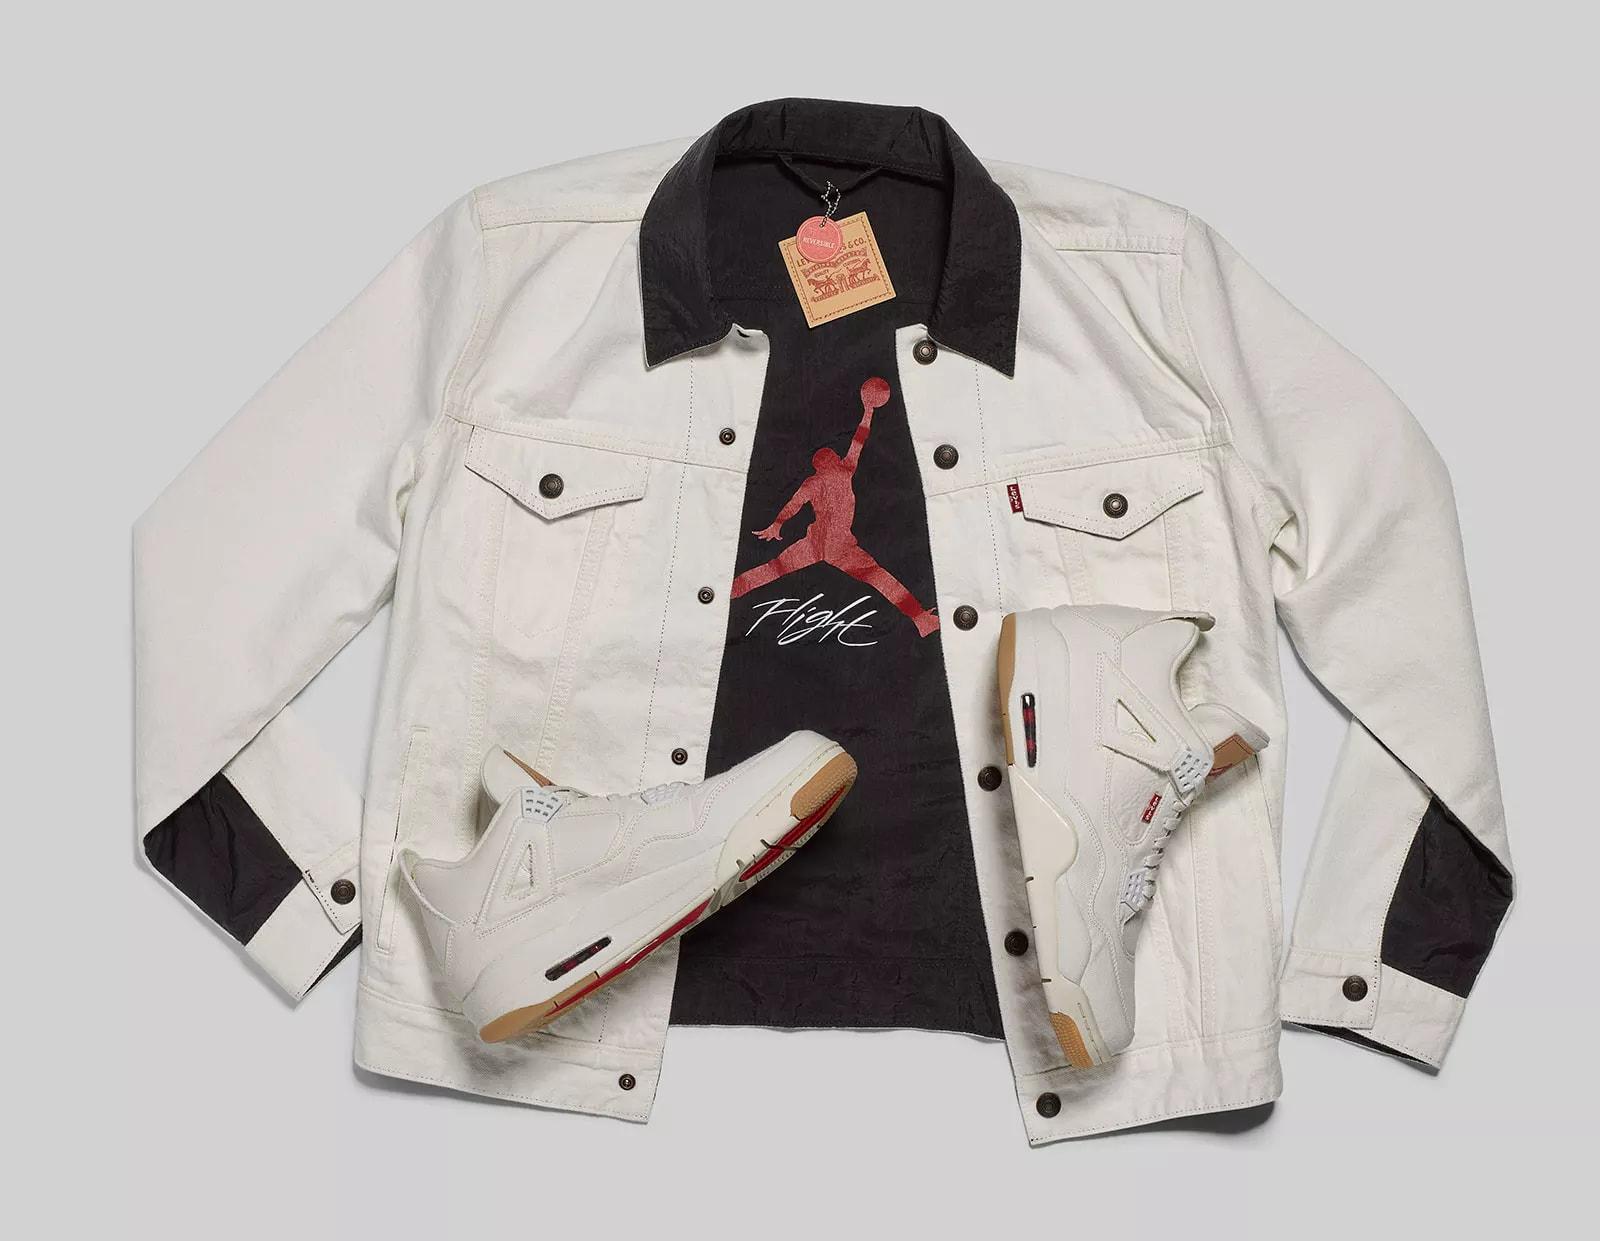 Levi's x Air Jordan 4 'White' AO2571-100 (Jacket)